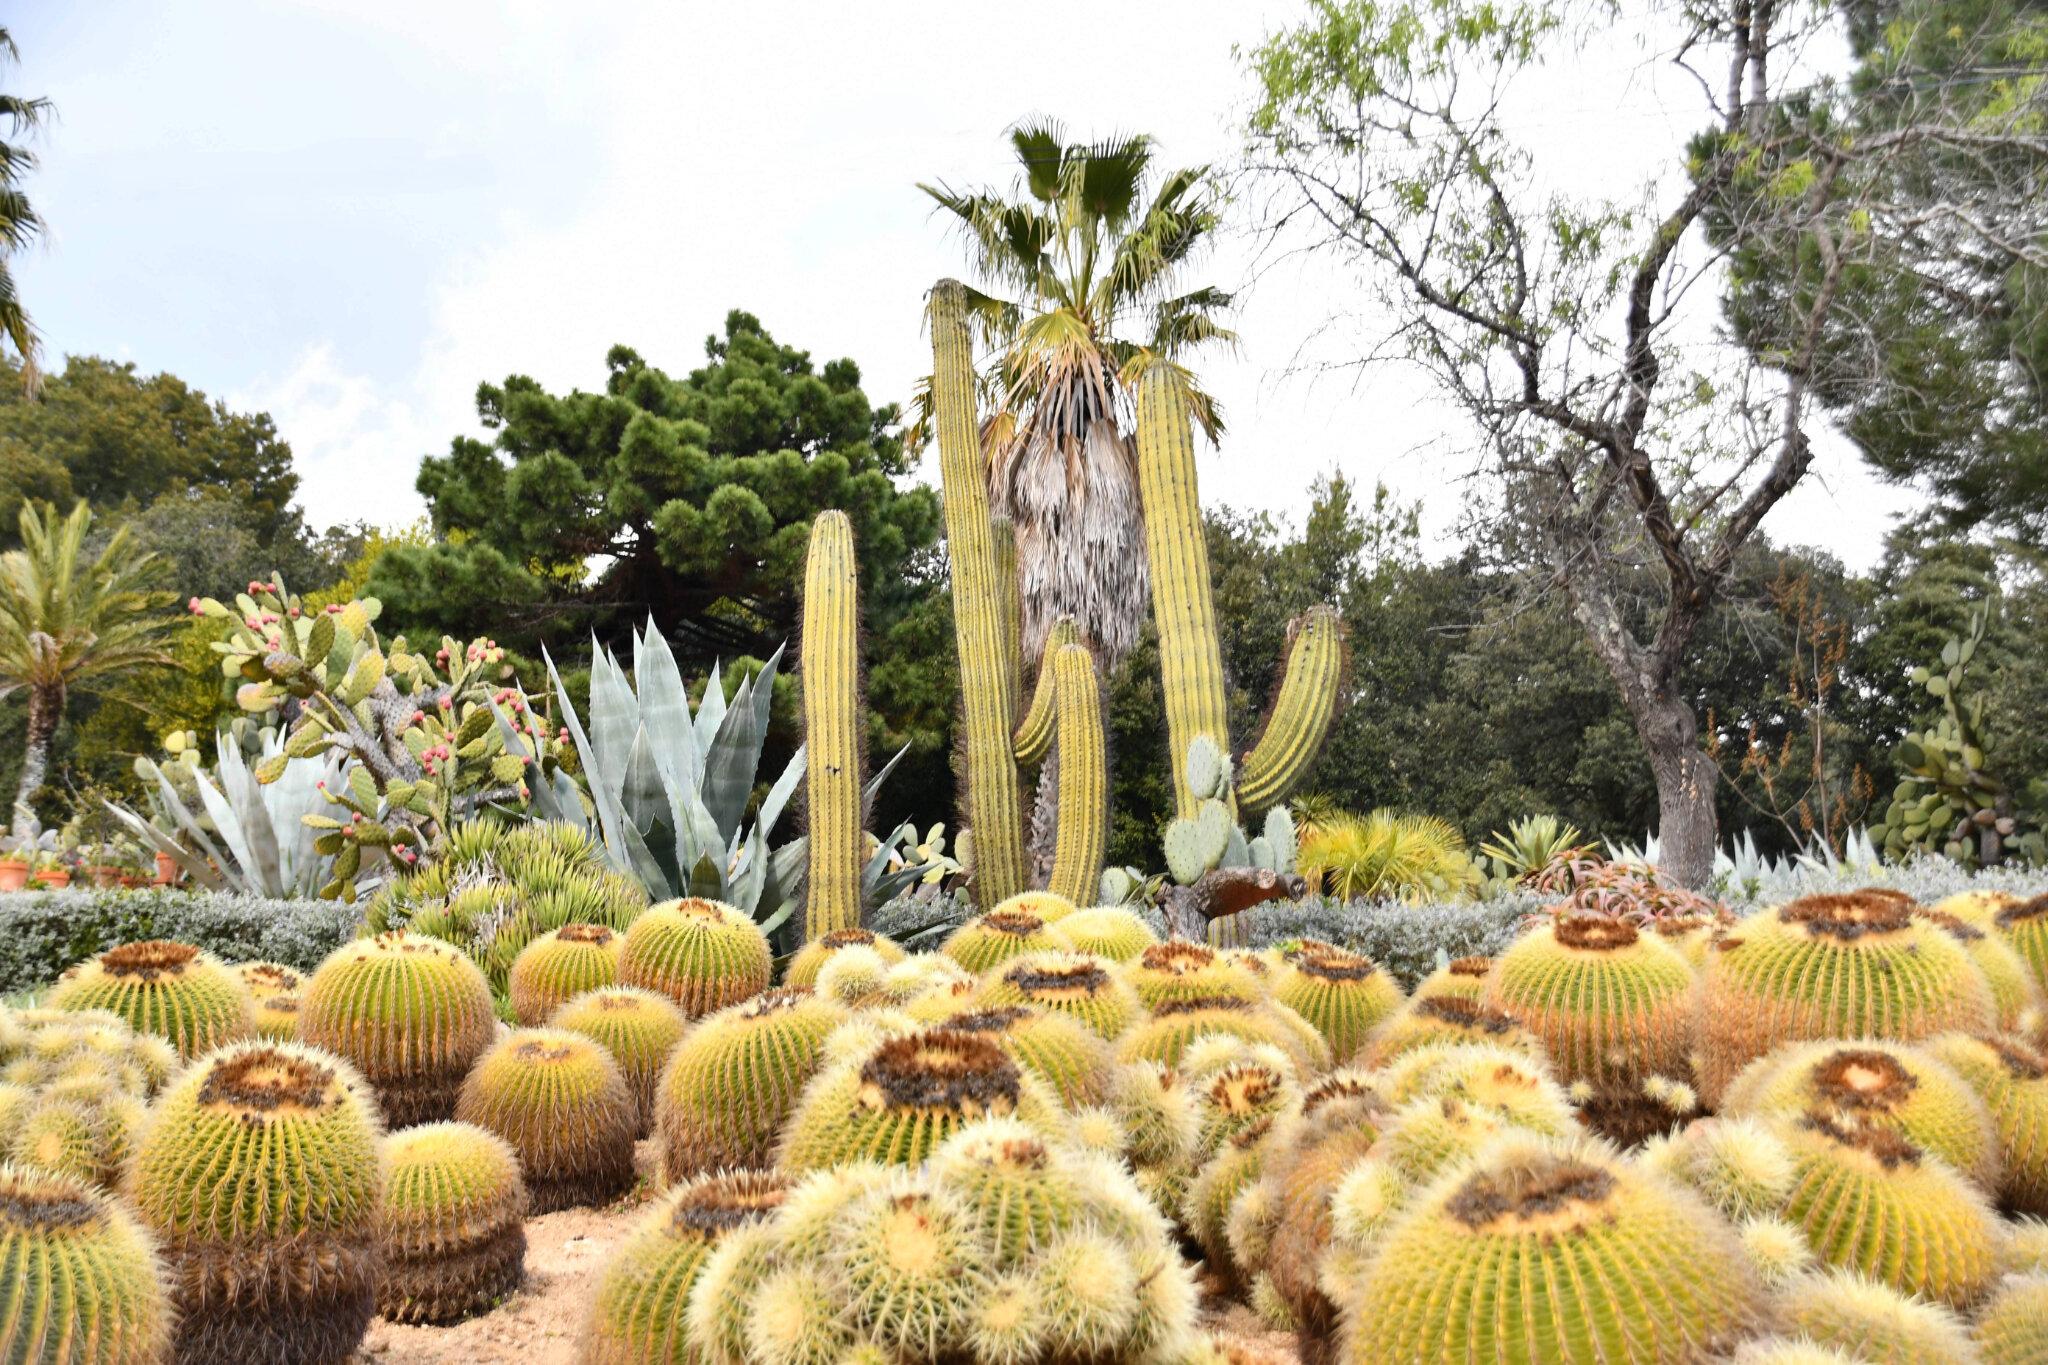 Exotique fleurs Rare semences rares jardin balcon plante honte Fleur